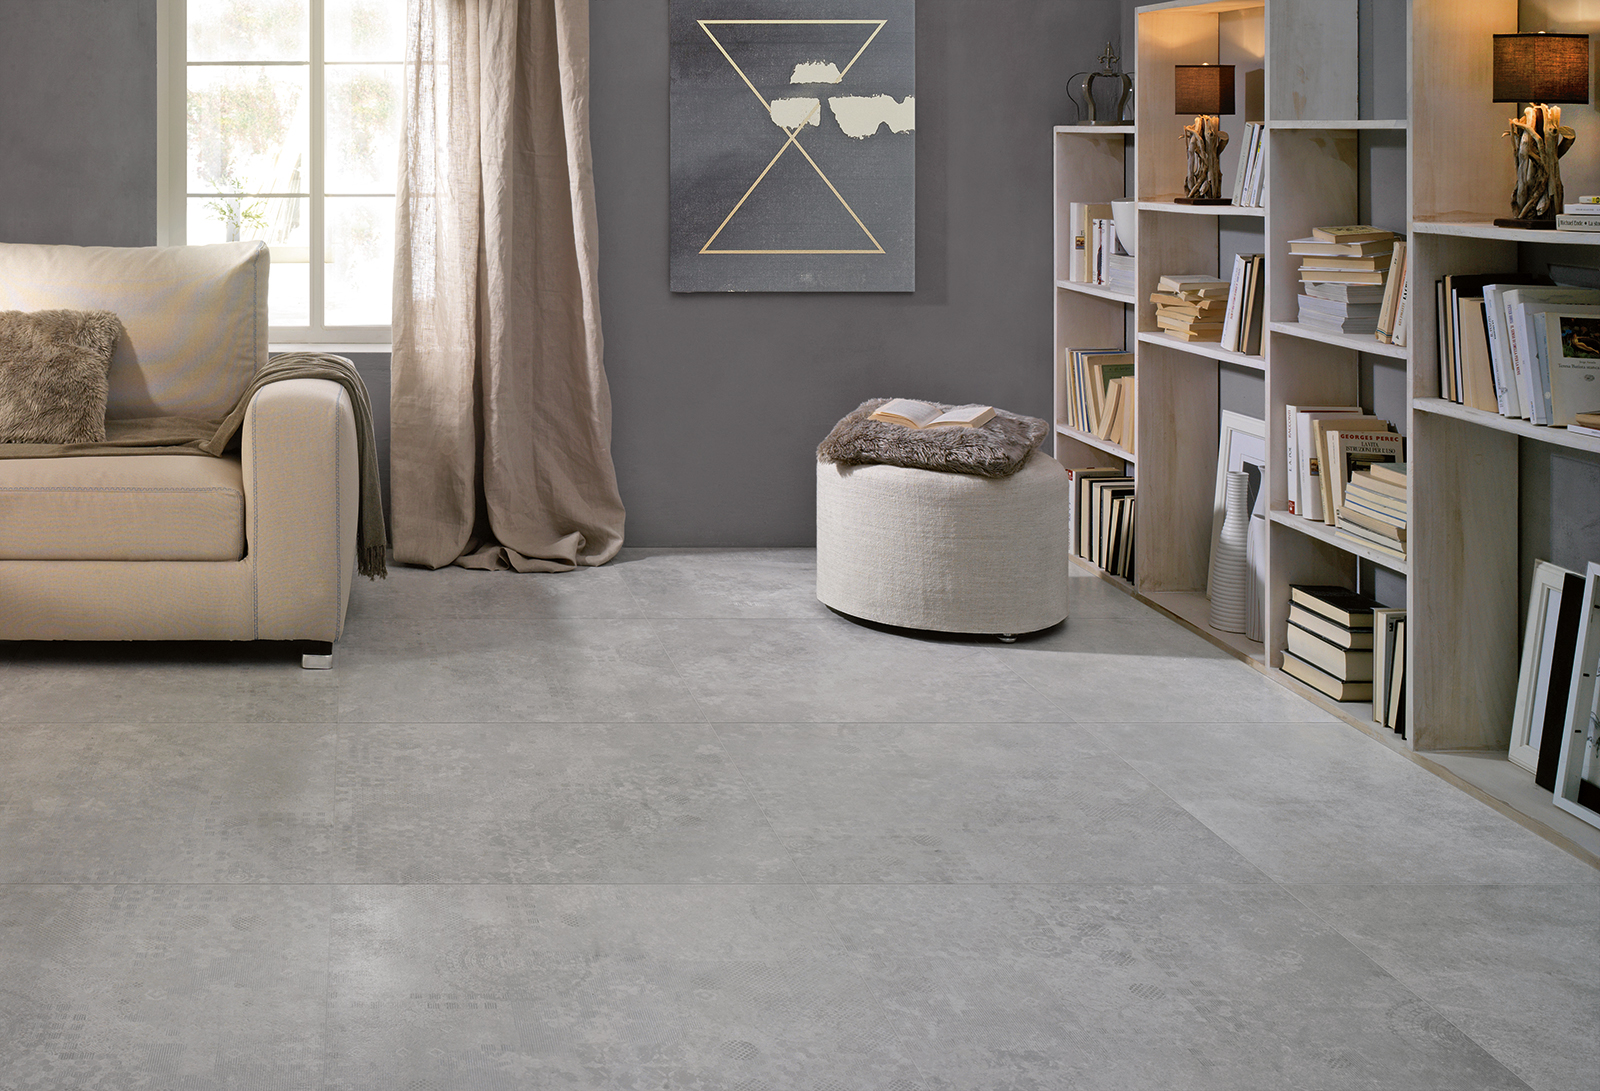 idee salva spazio in casa armonie ceramiche. Black Bedroom Furniture Sets. Home Design Ideas